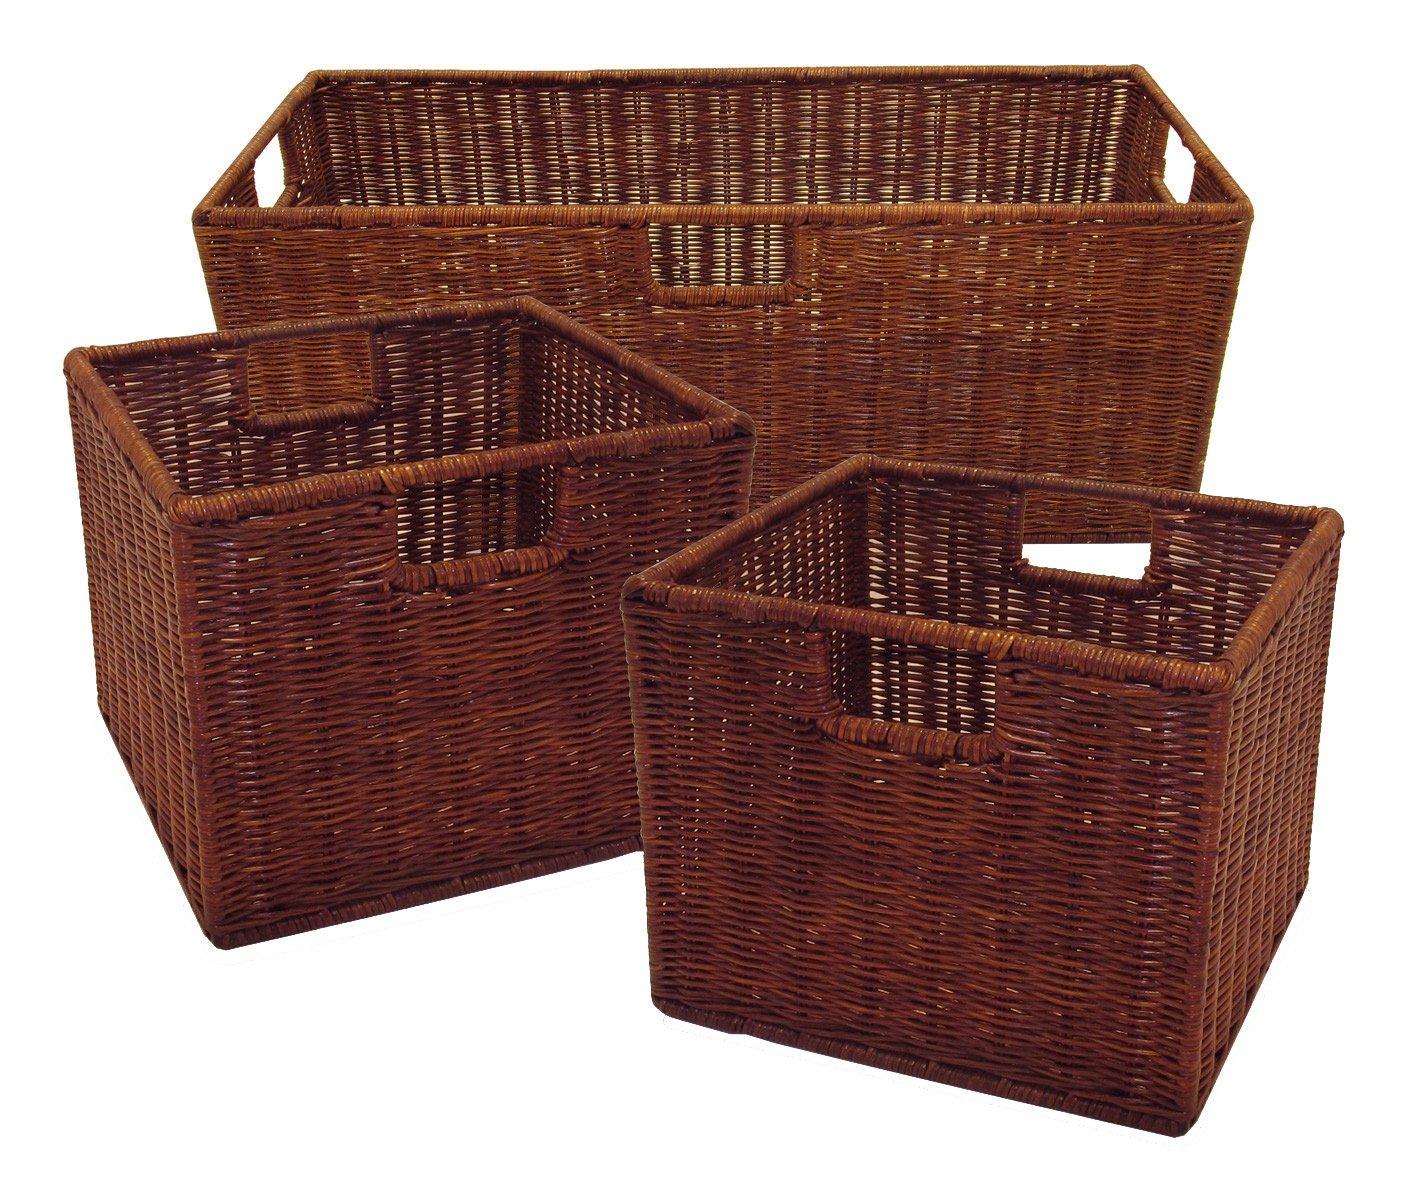 Winsome Wood Leo Storage Baskets, Set of 3, Walnut by Winsome Wood (Image #1)